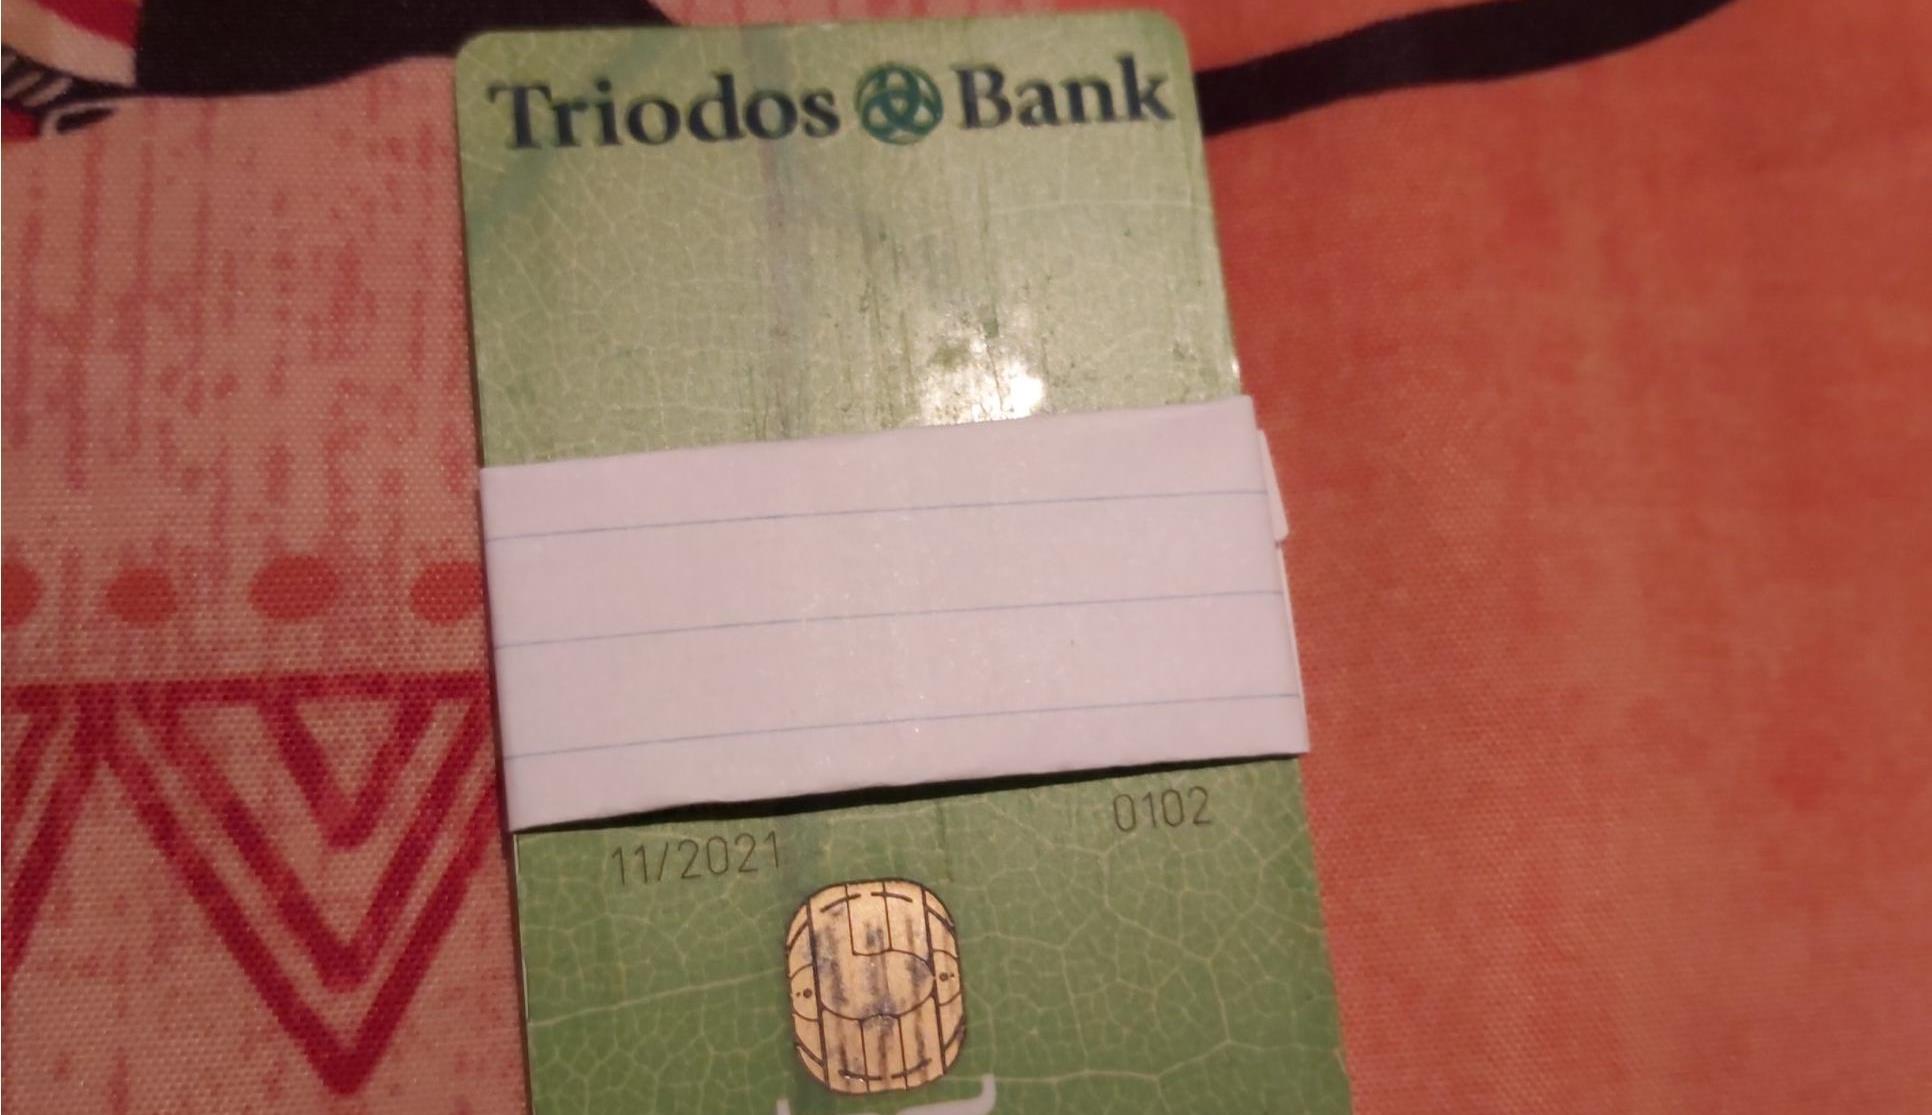 Triodos Bankpas gevonden